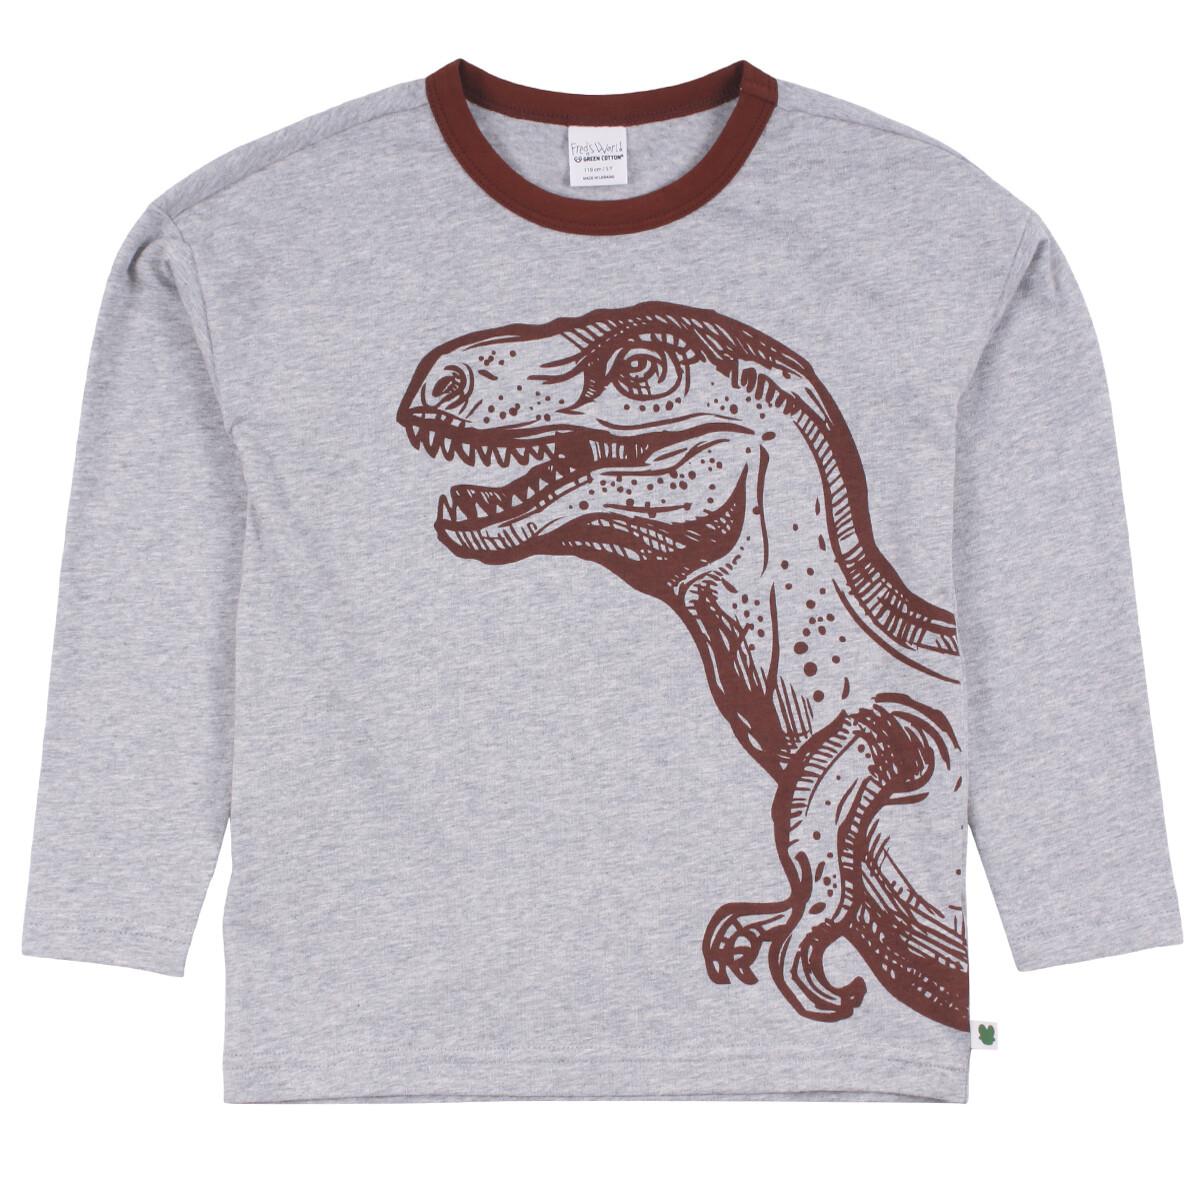 Fred's World Boys Dino Drop Grey Shirt